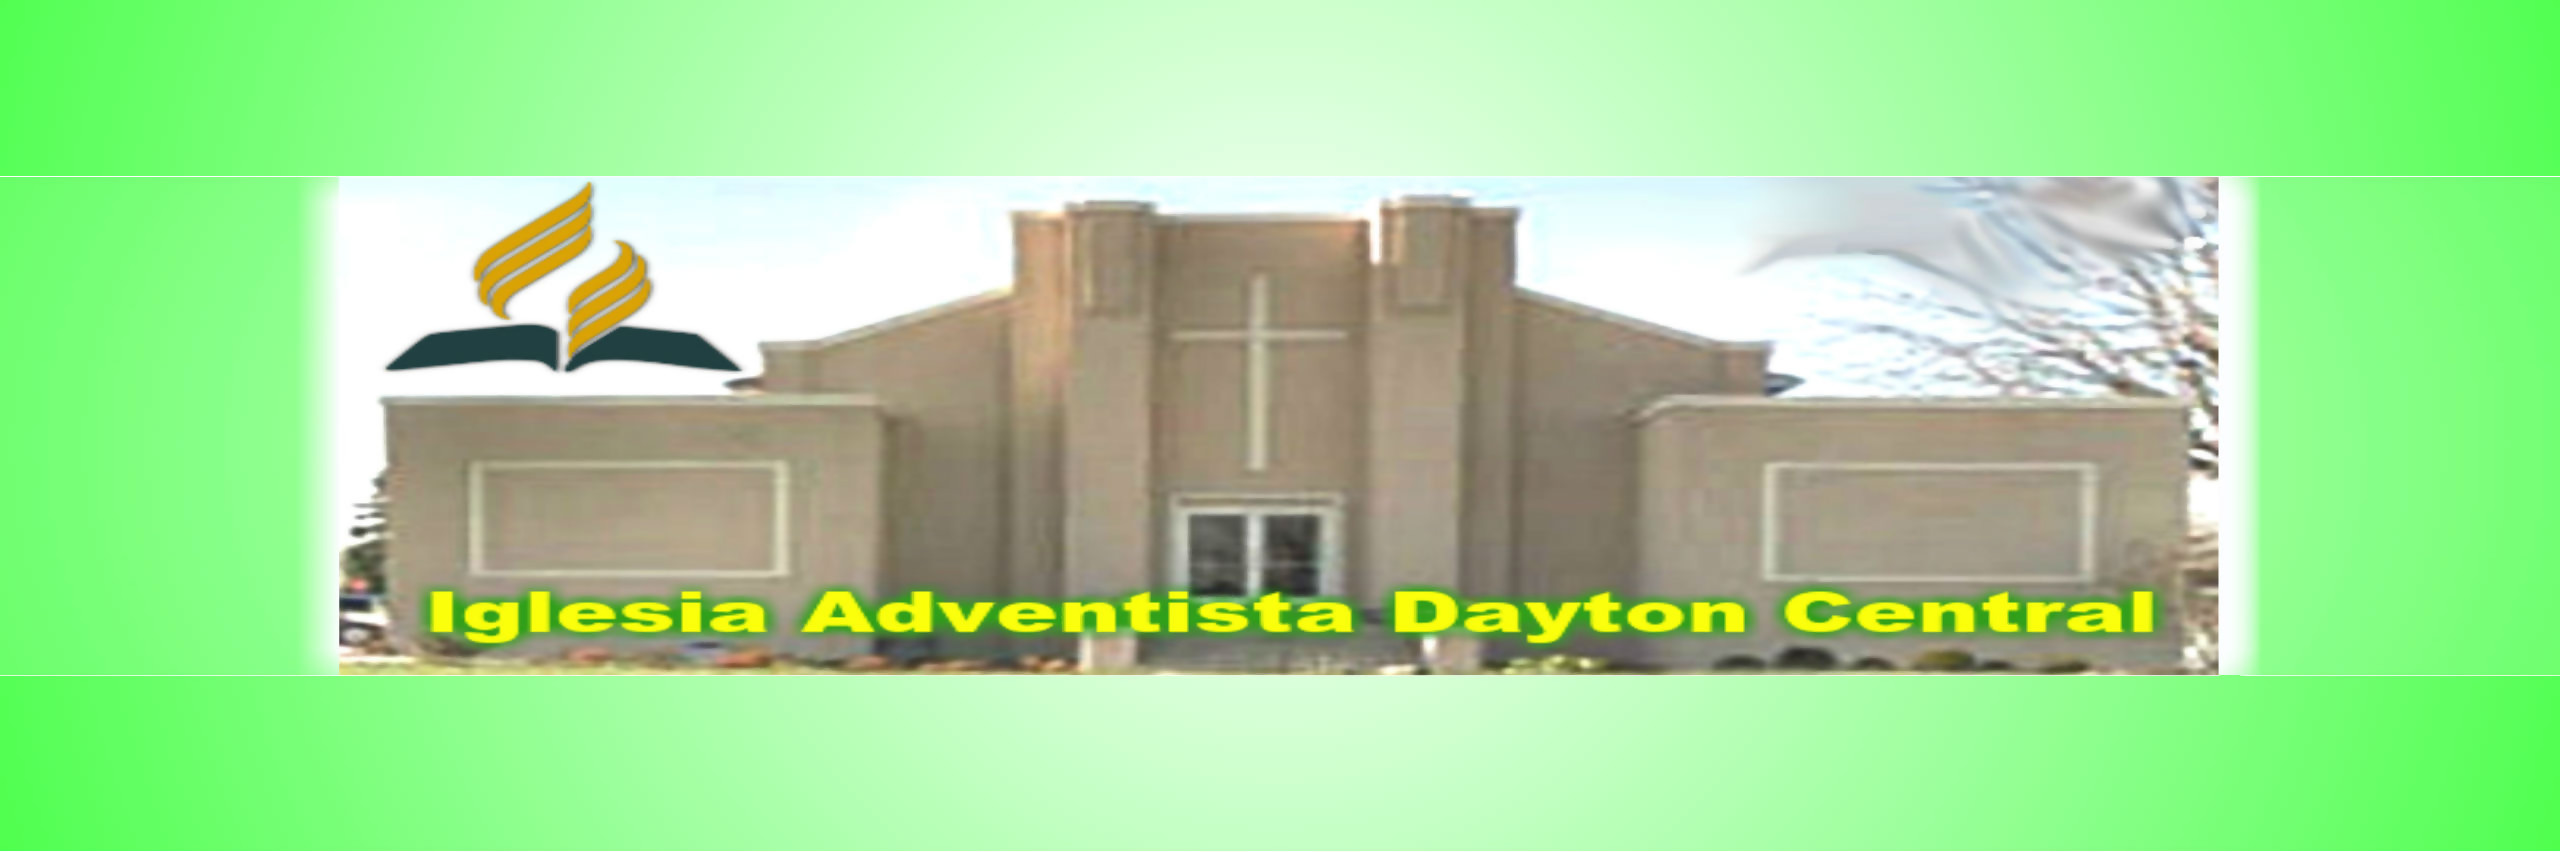 Dayton Central Spanish